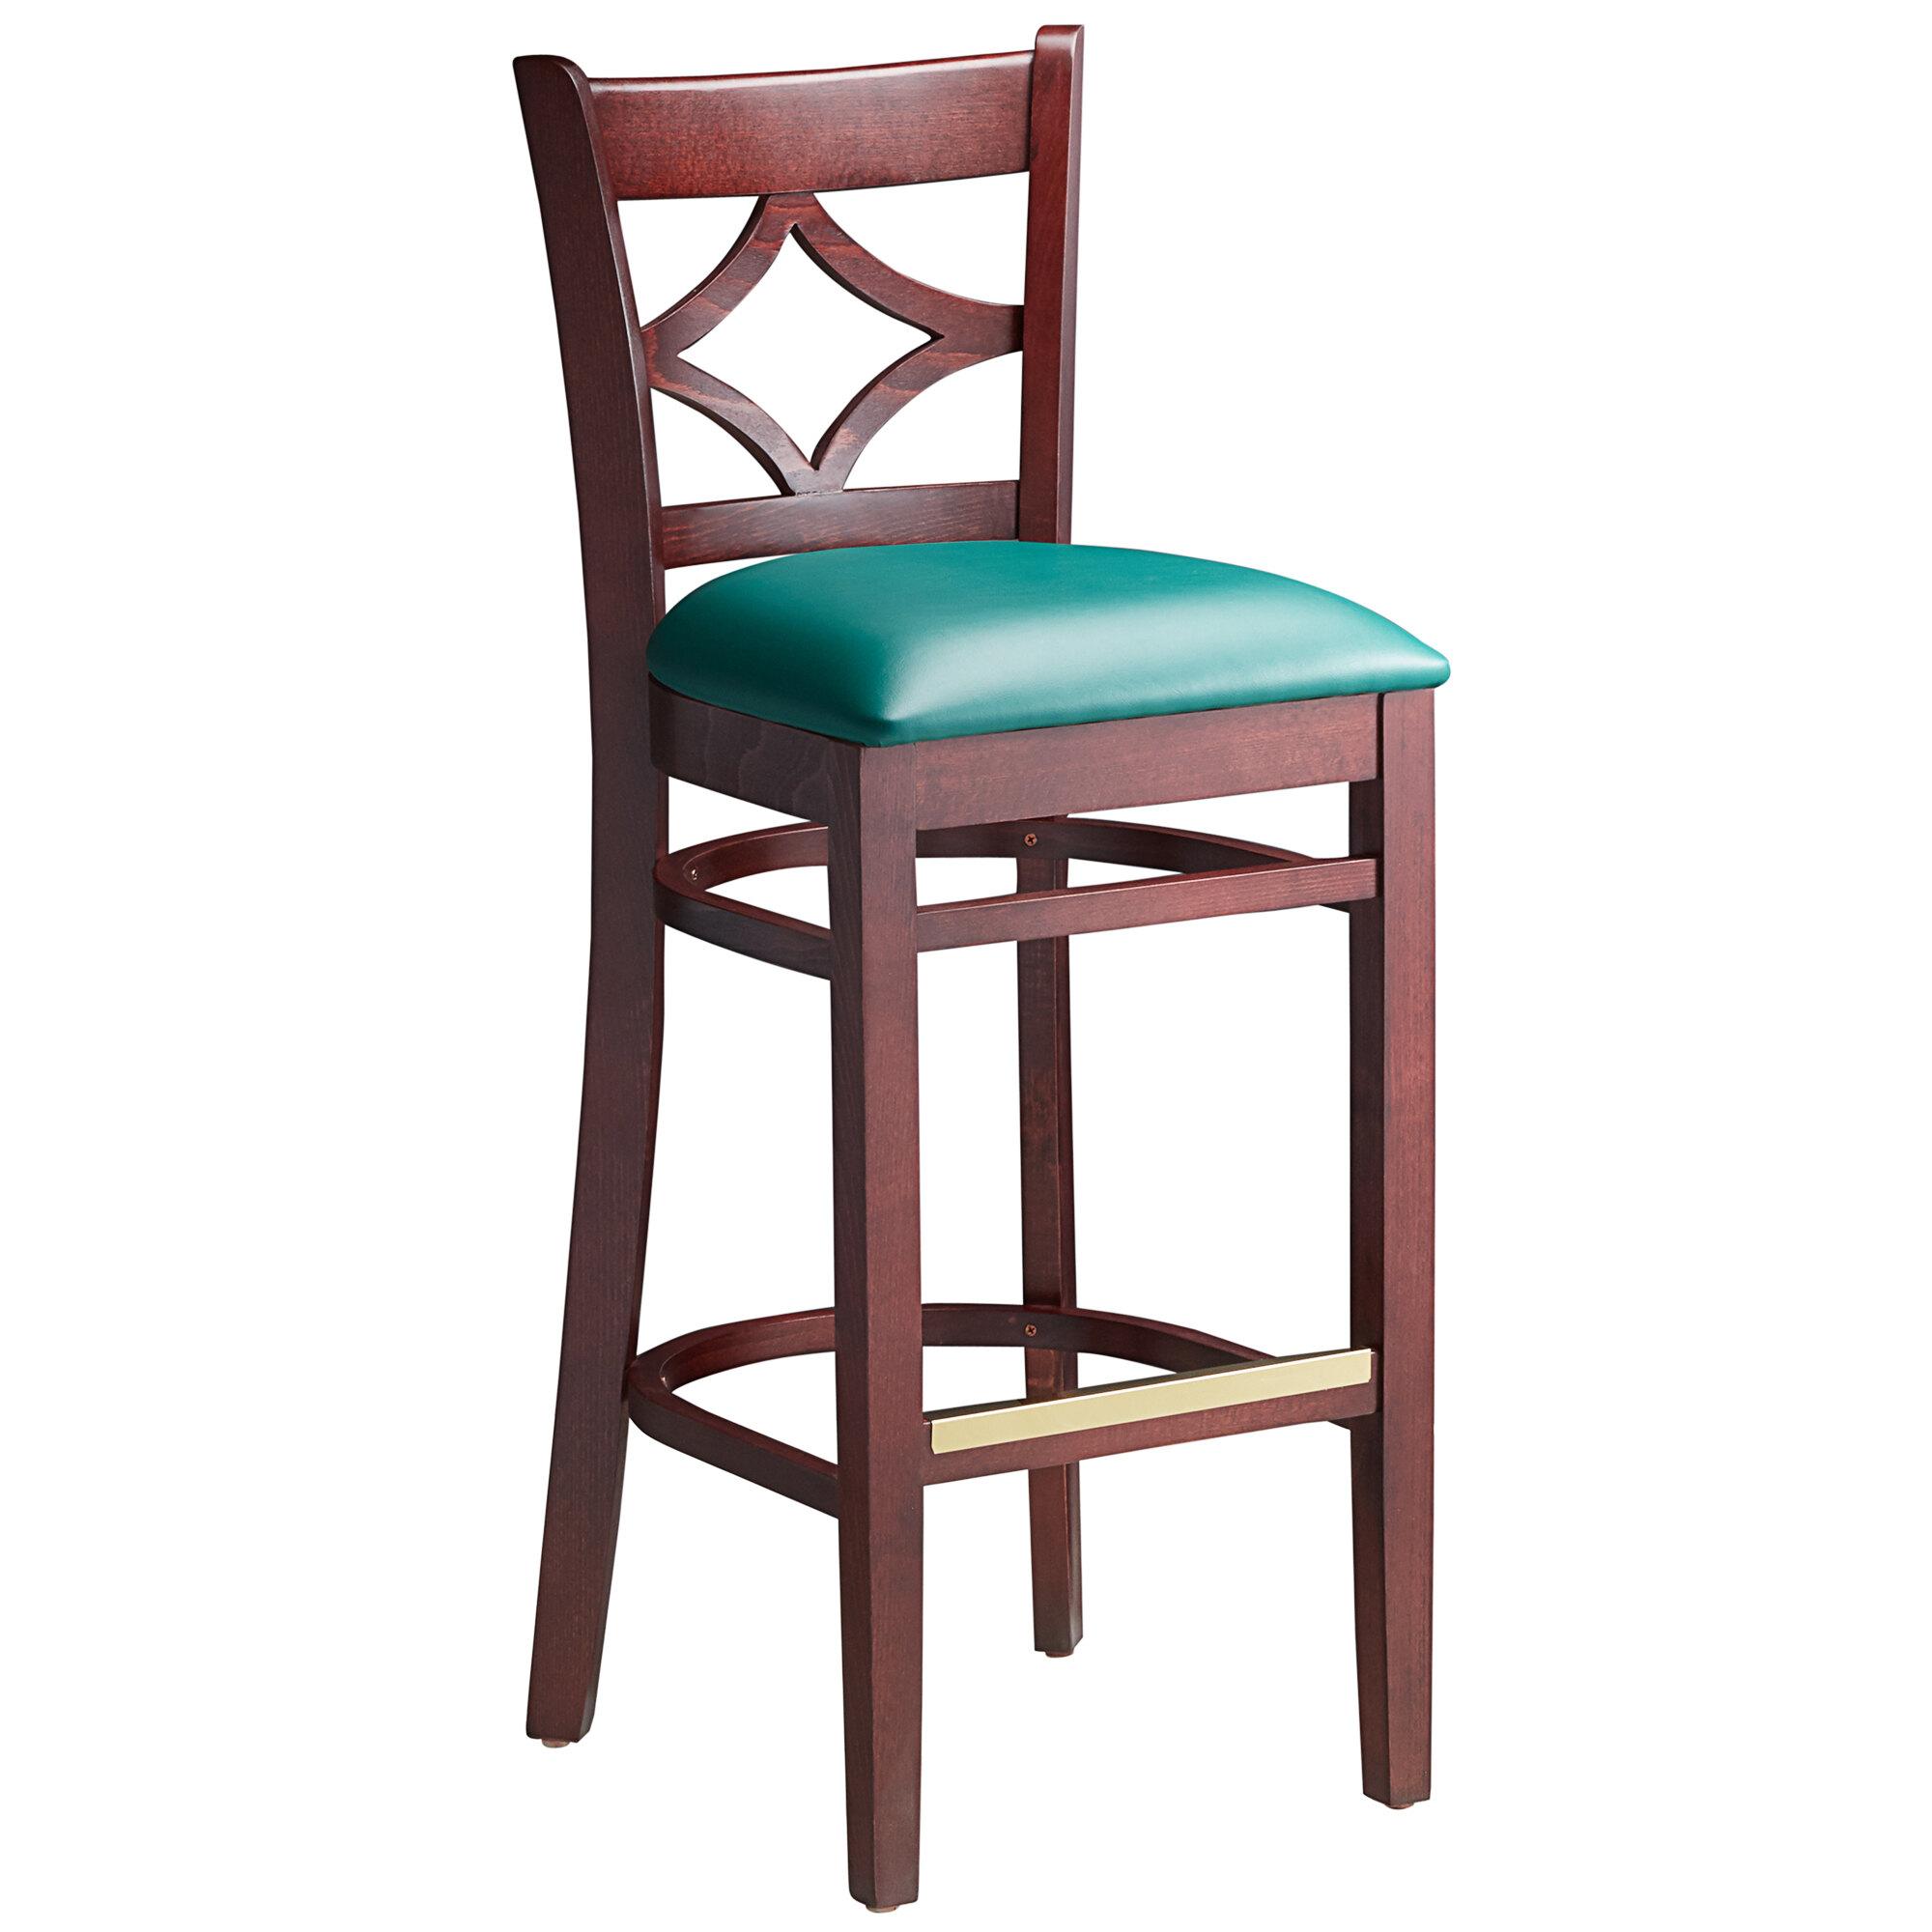 #106 - Mahogany Wood Finished Diamond Back Restaurant Barstool with Green Vinyl Seat